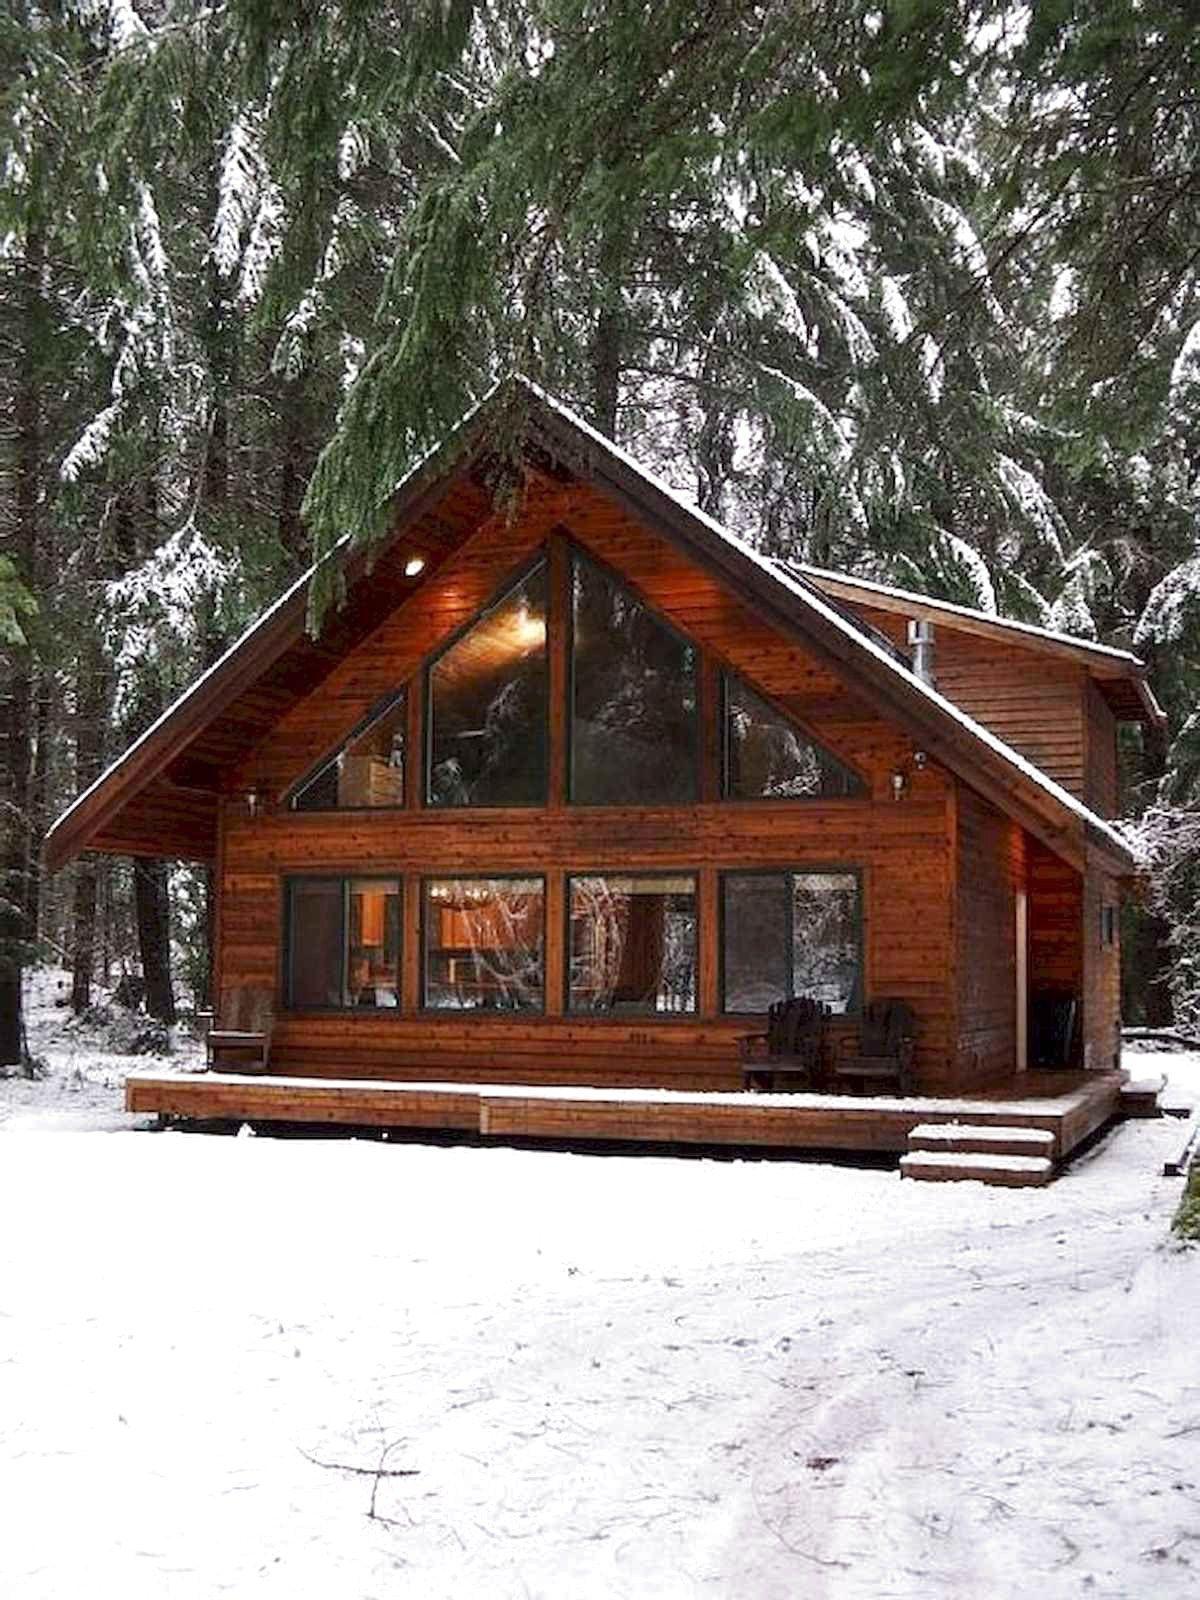 71 Favourite Small Log Cabin Homes Design Ideas Cabin Plans With Loft Small Log Cabin Log Cabin Designs